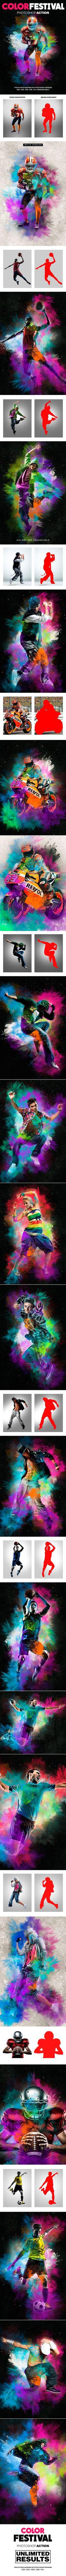 Color Festival Photoshop Action  Dust Effect — Photoshop ATN #action • Download ➝ https://graphicriver.net/item/color-festival-photoshop-action-dust-effect/19250033?ref=pxcr